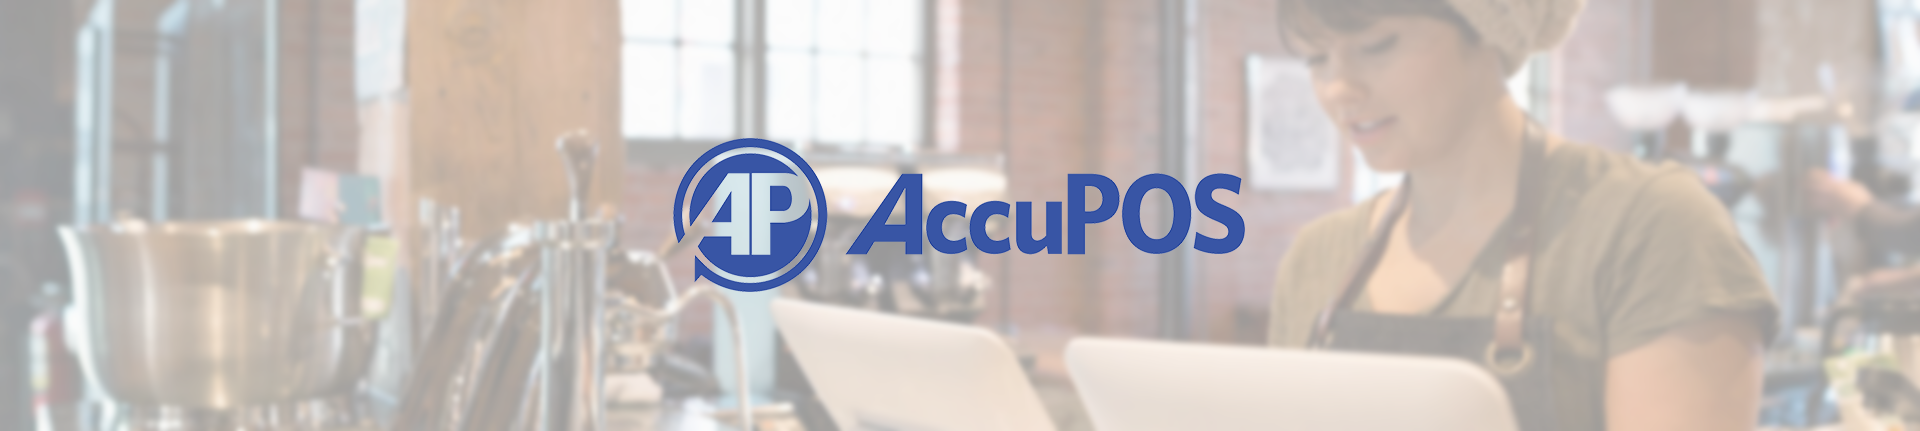 AccuPOS integration partner